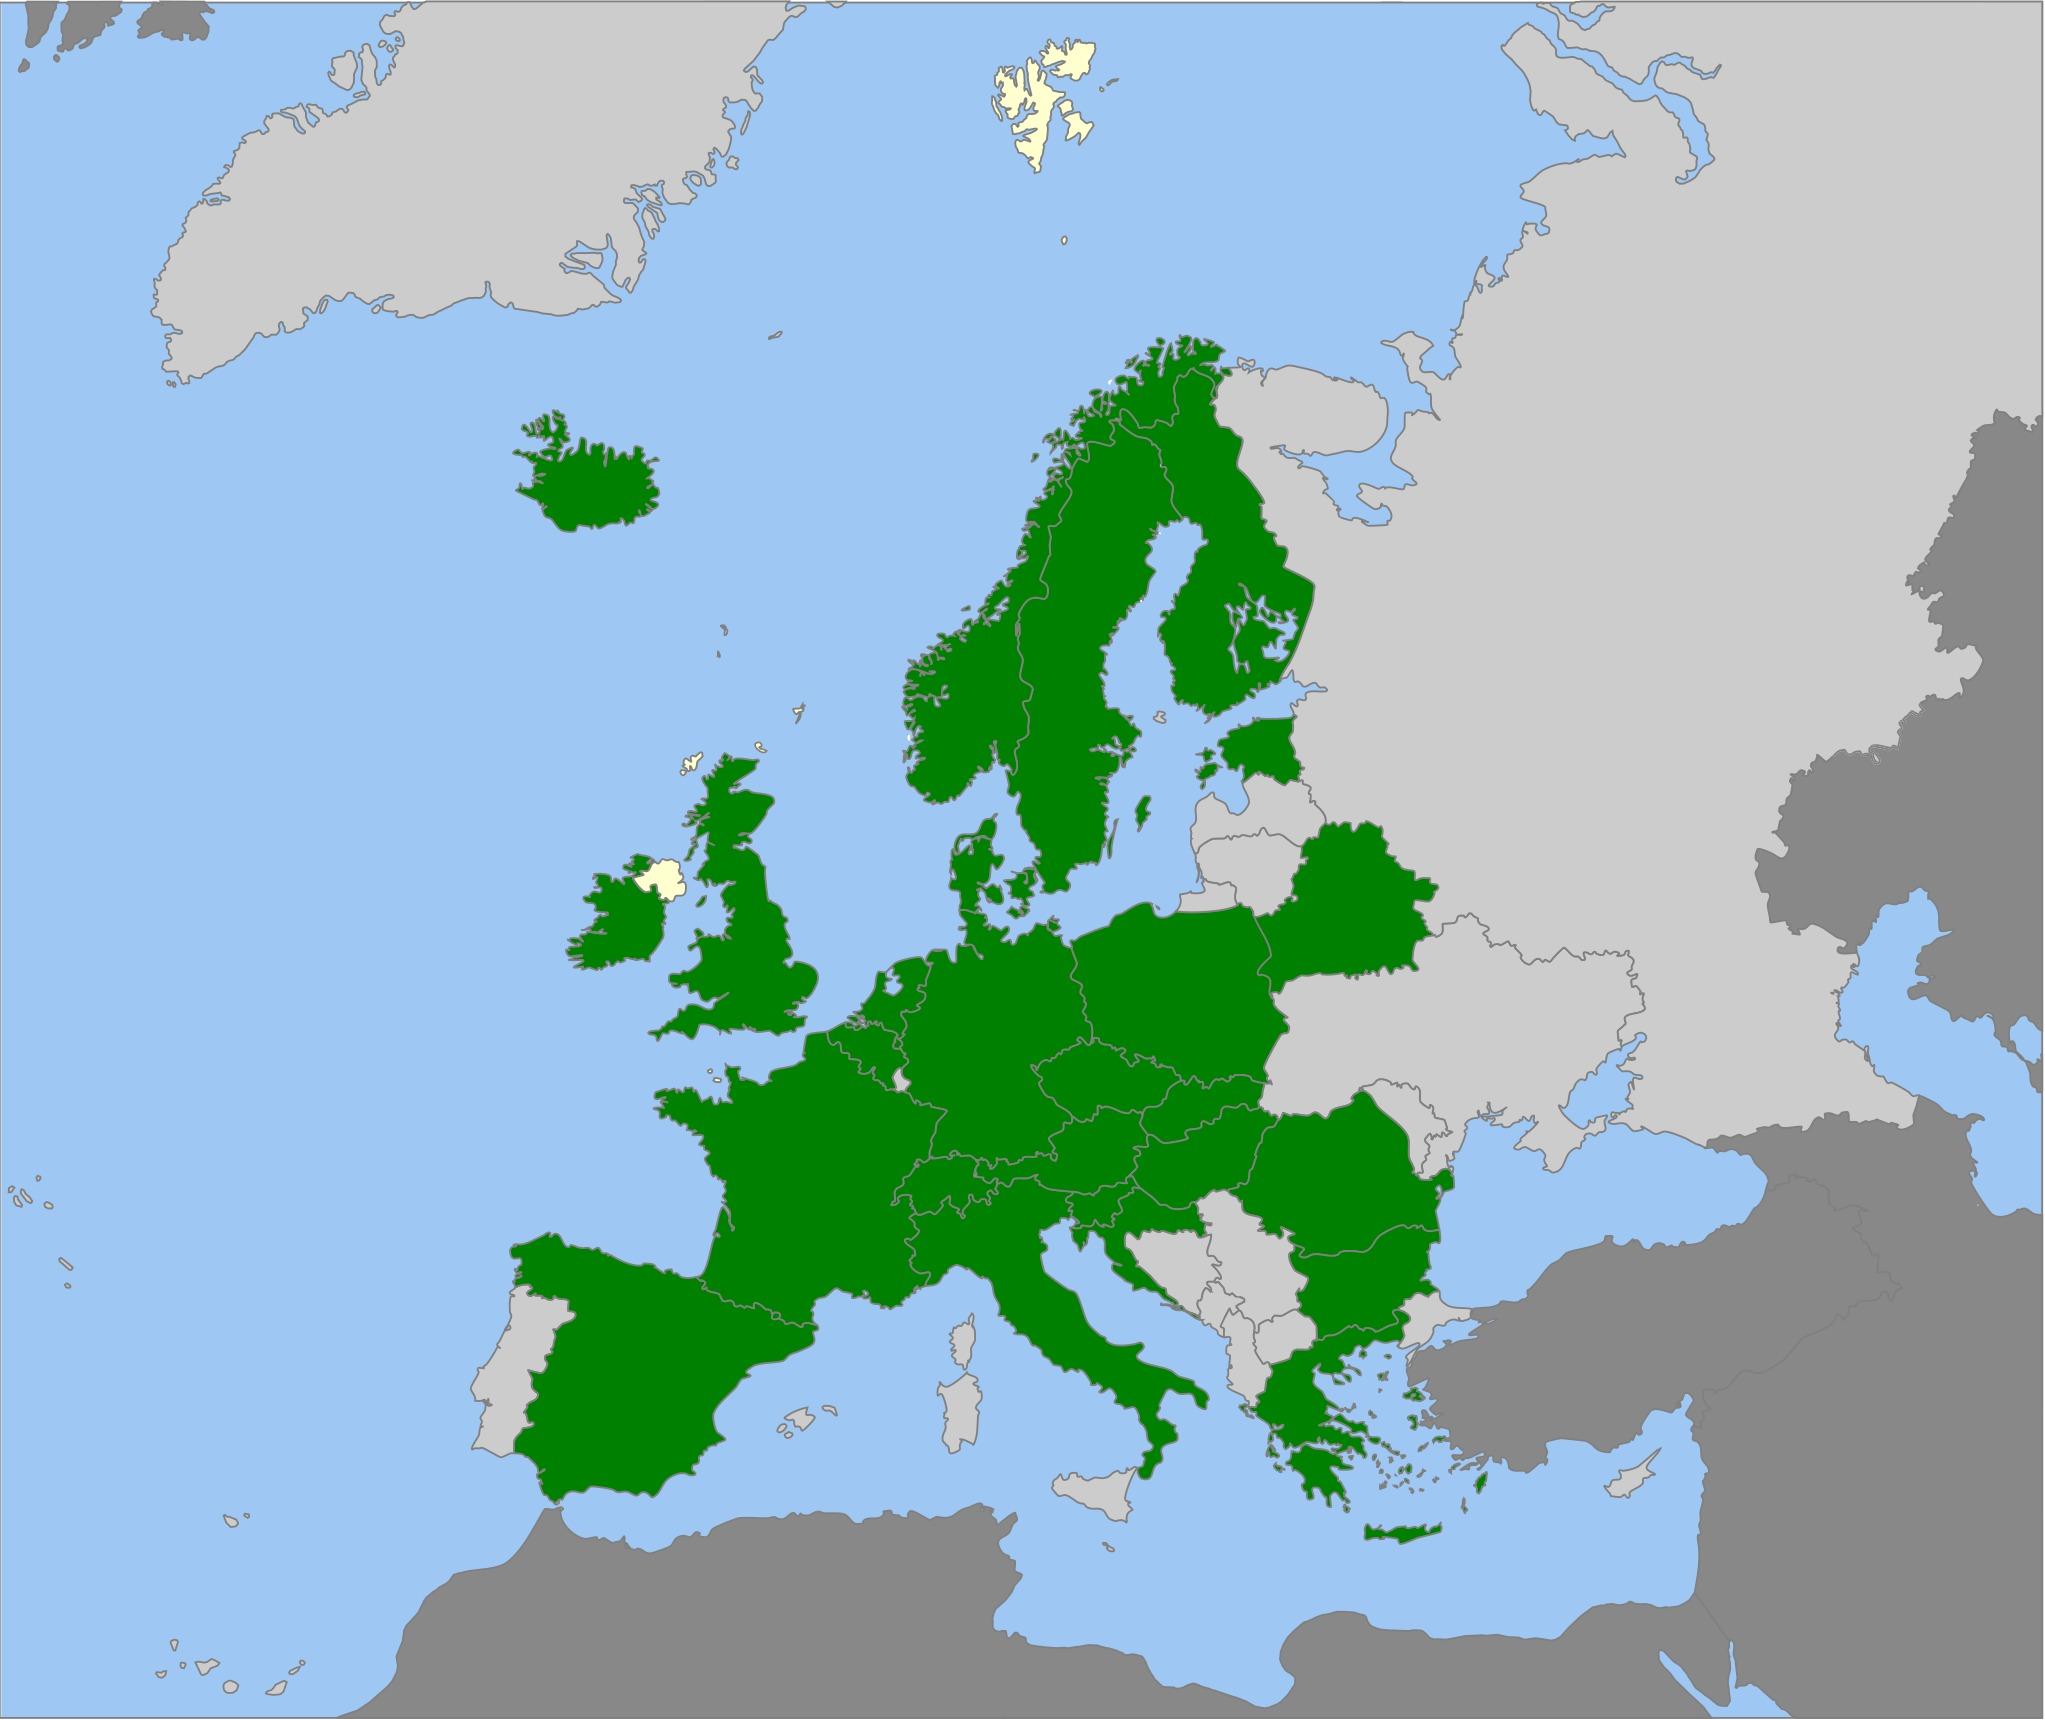 "<span class=""translation_missing"" title=""translation missing: en.medium.untitled.map_image_of, page_name: &lt;i&gt;Russula acrifolia&lt;/i&gt; Romagn. 1997"">Map Image Of</span>"